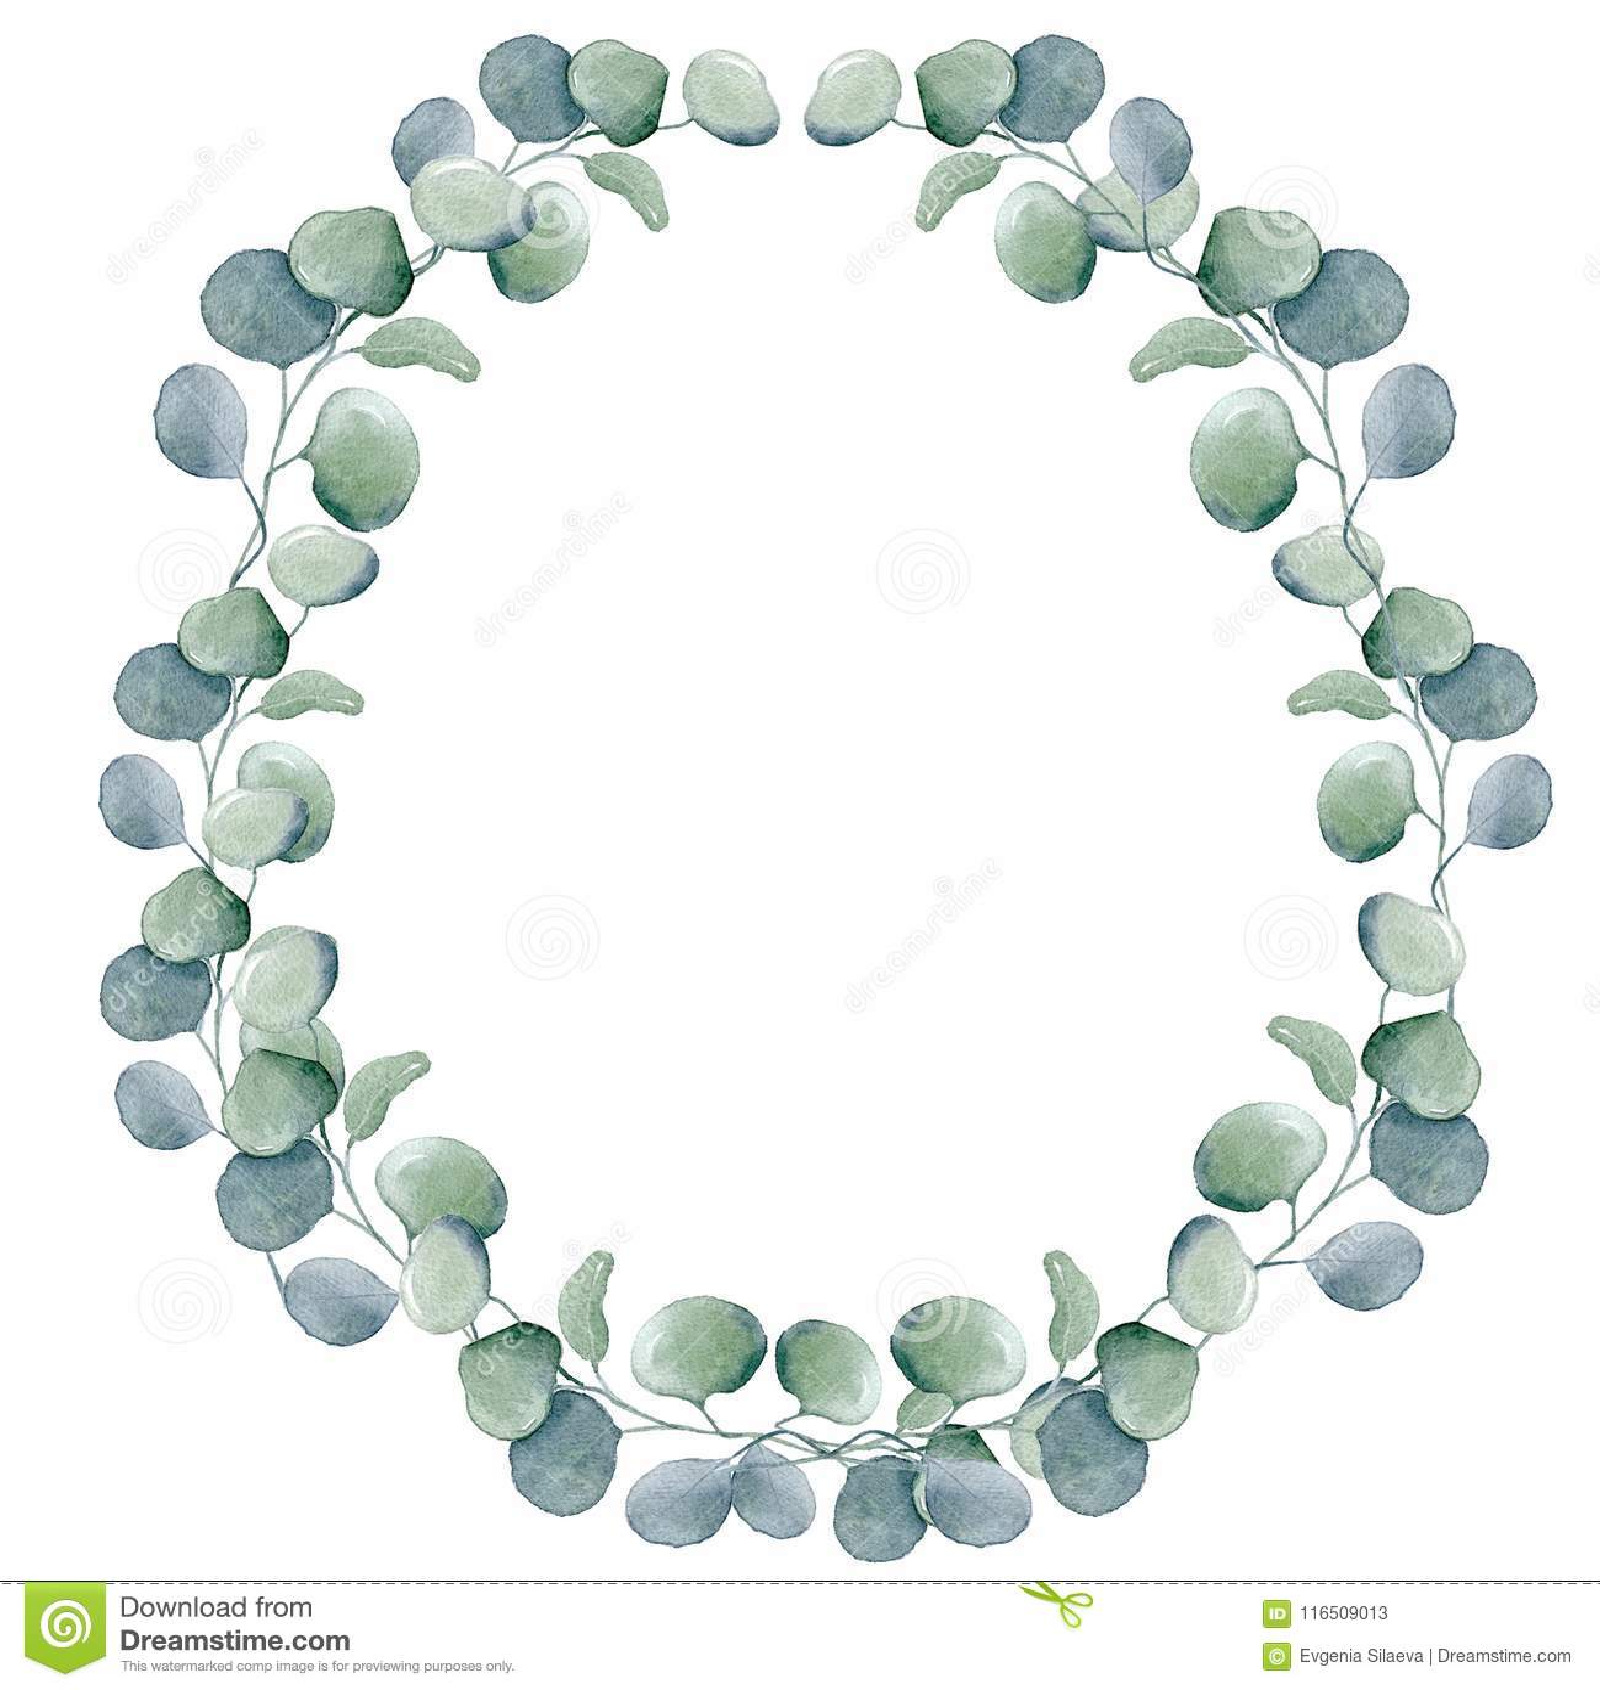 Floral στεφάνια Watercolor με την κορδέλλα για το κείμενό σας το έμβλημα είναι μπορεί διαφορετικοί floral σκοποί απεικόνισης χρησ